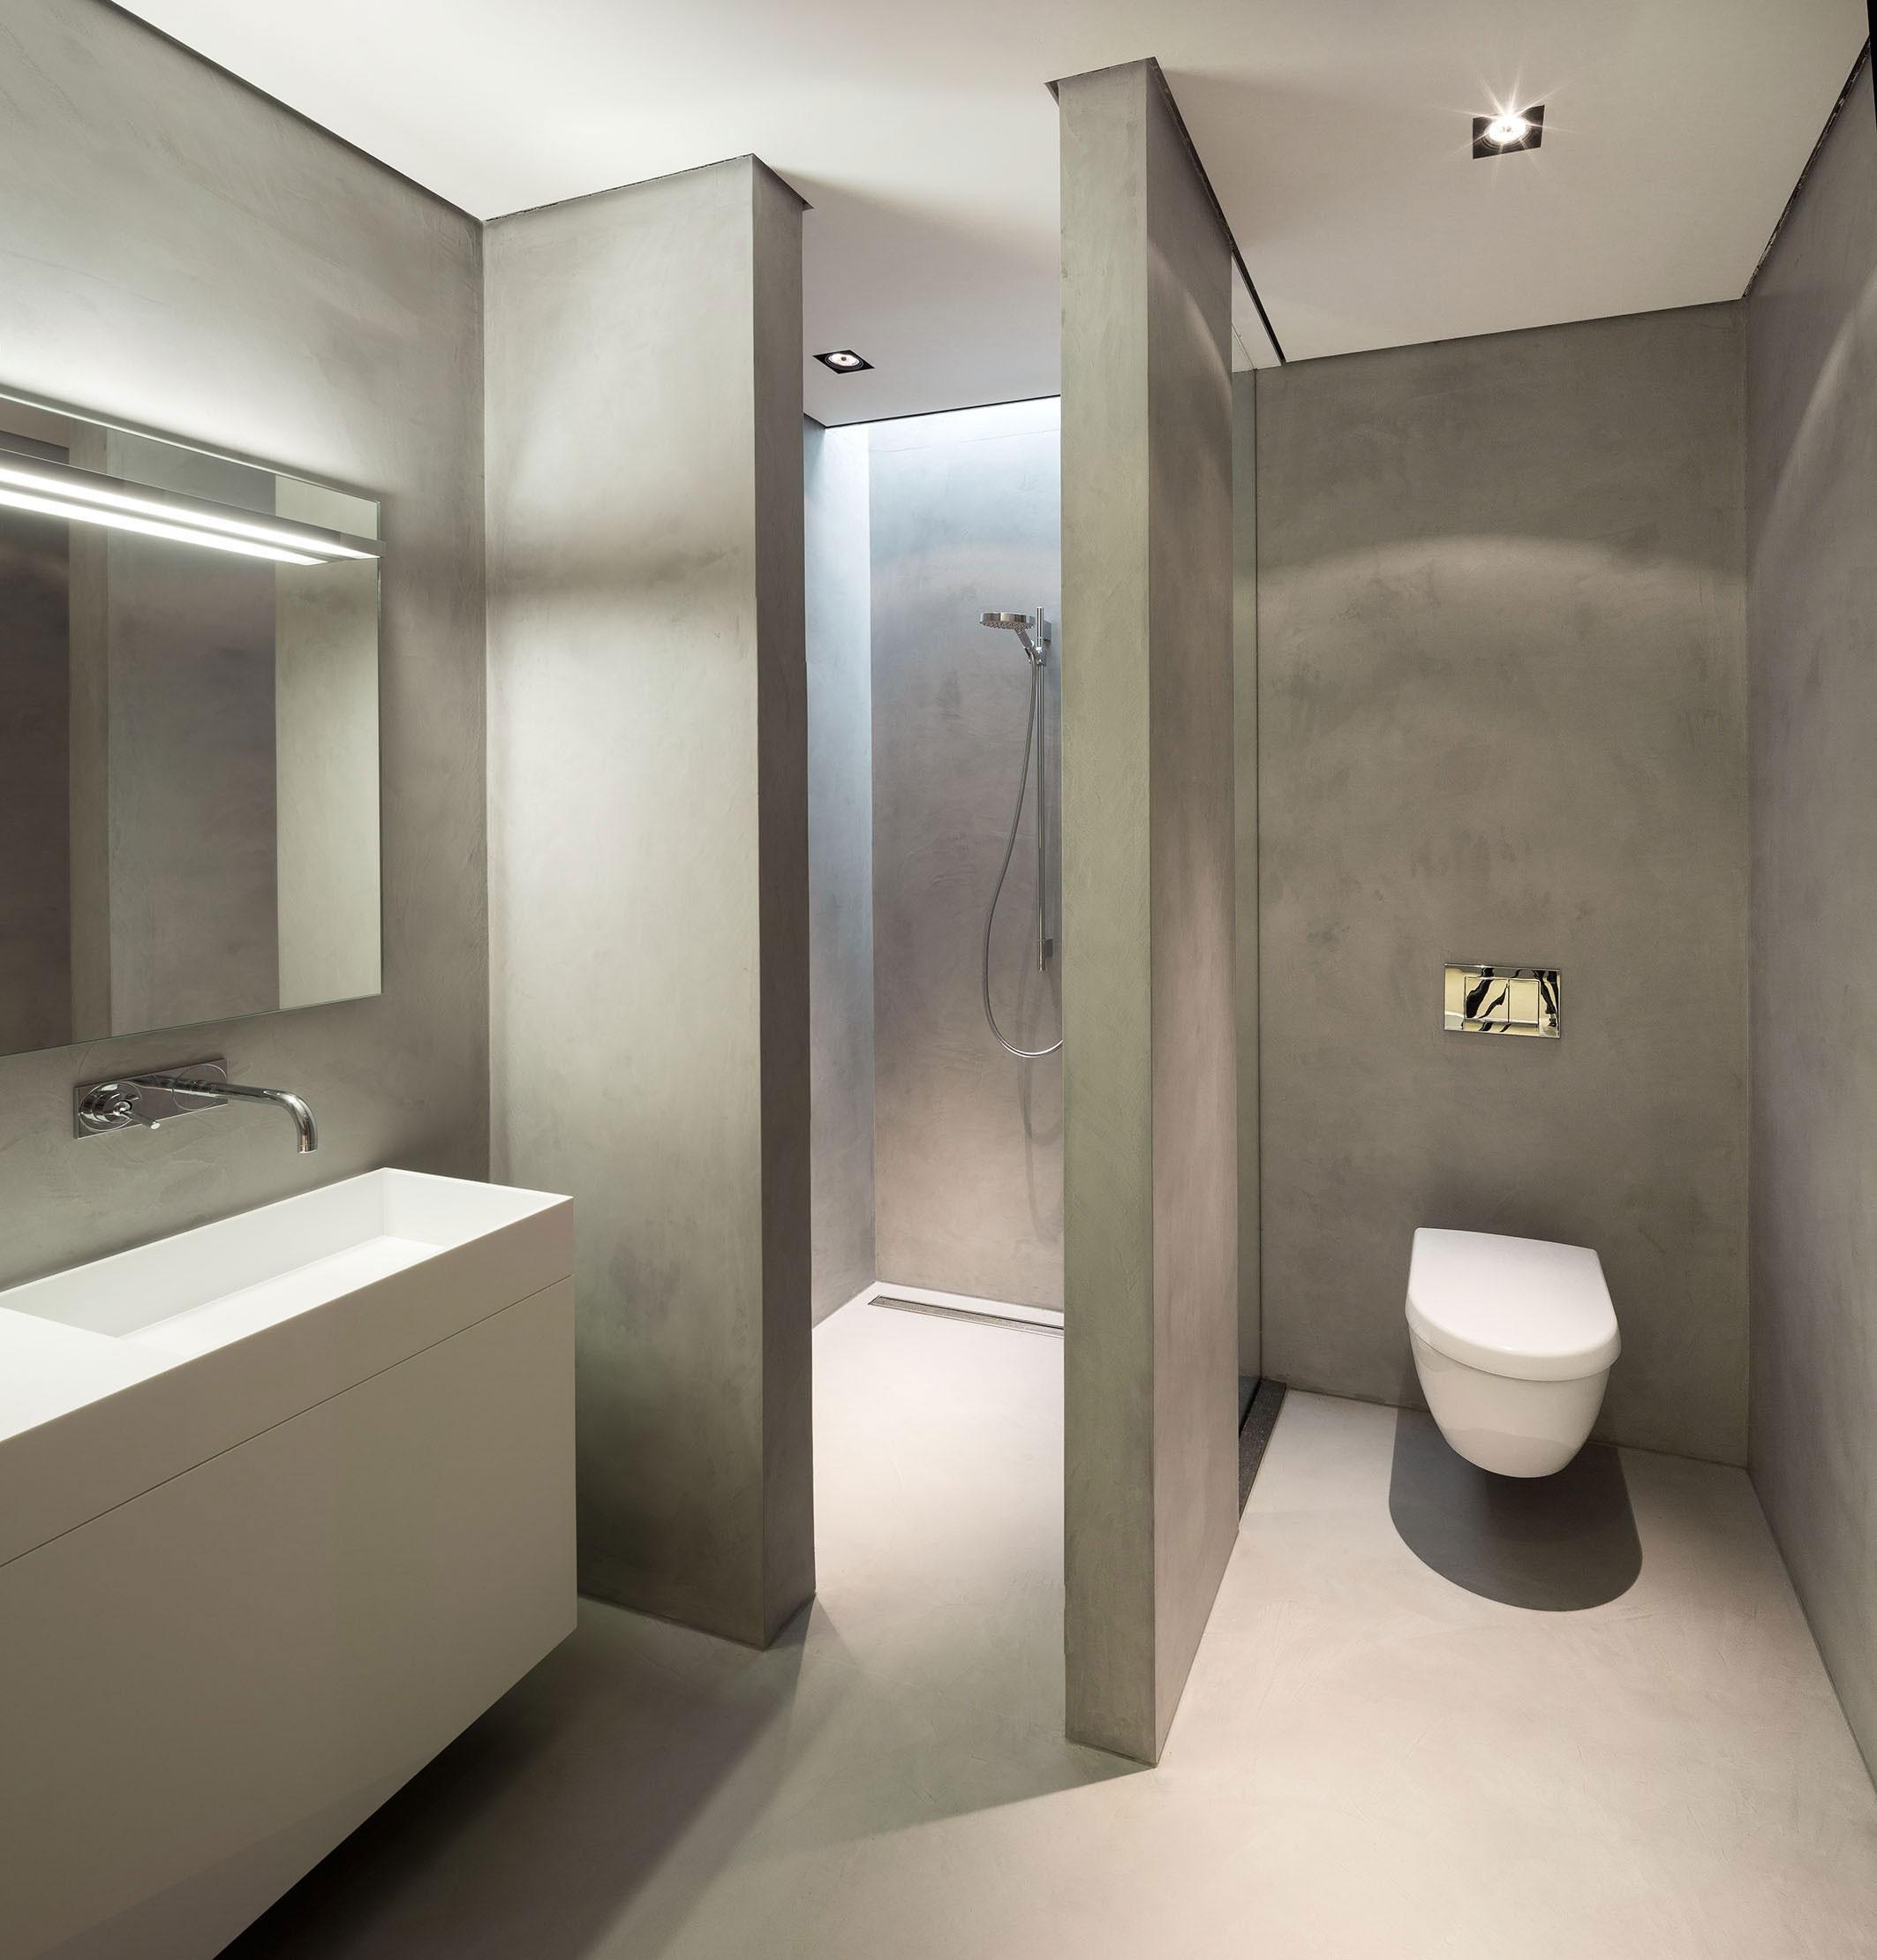 Modern Huizen Country House Located in a Quiet Rural Setting by De Brouwer Binnenwerk-21